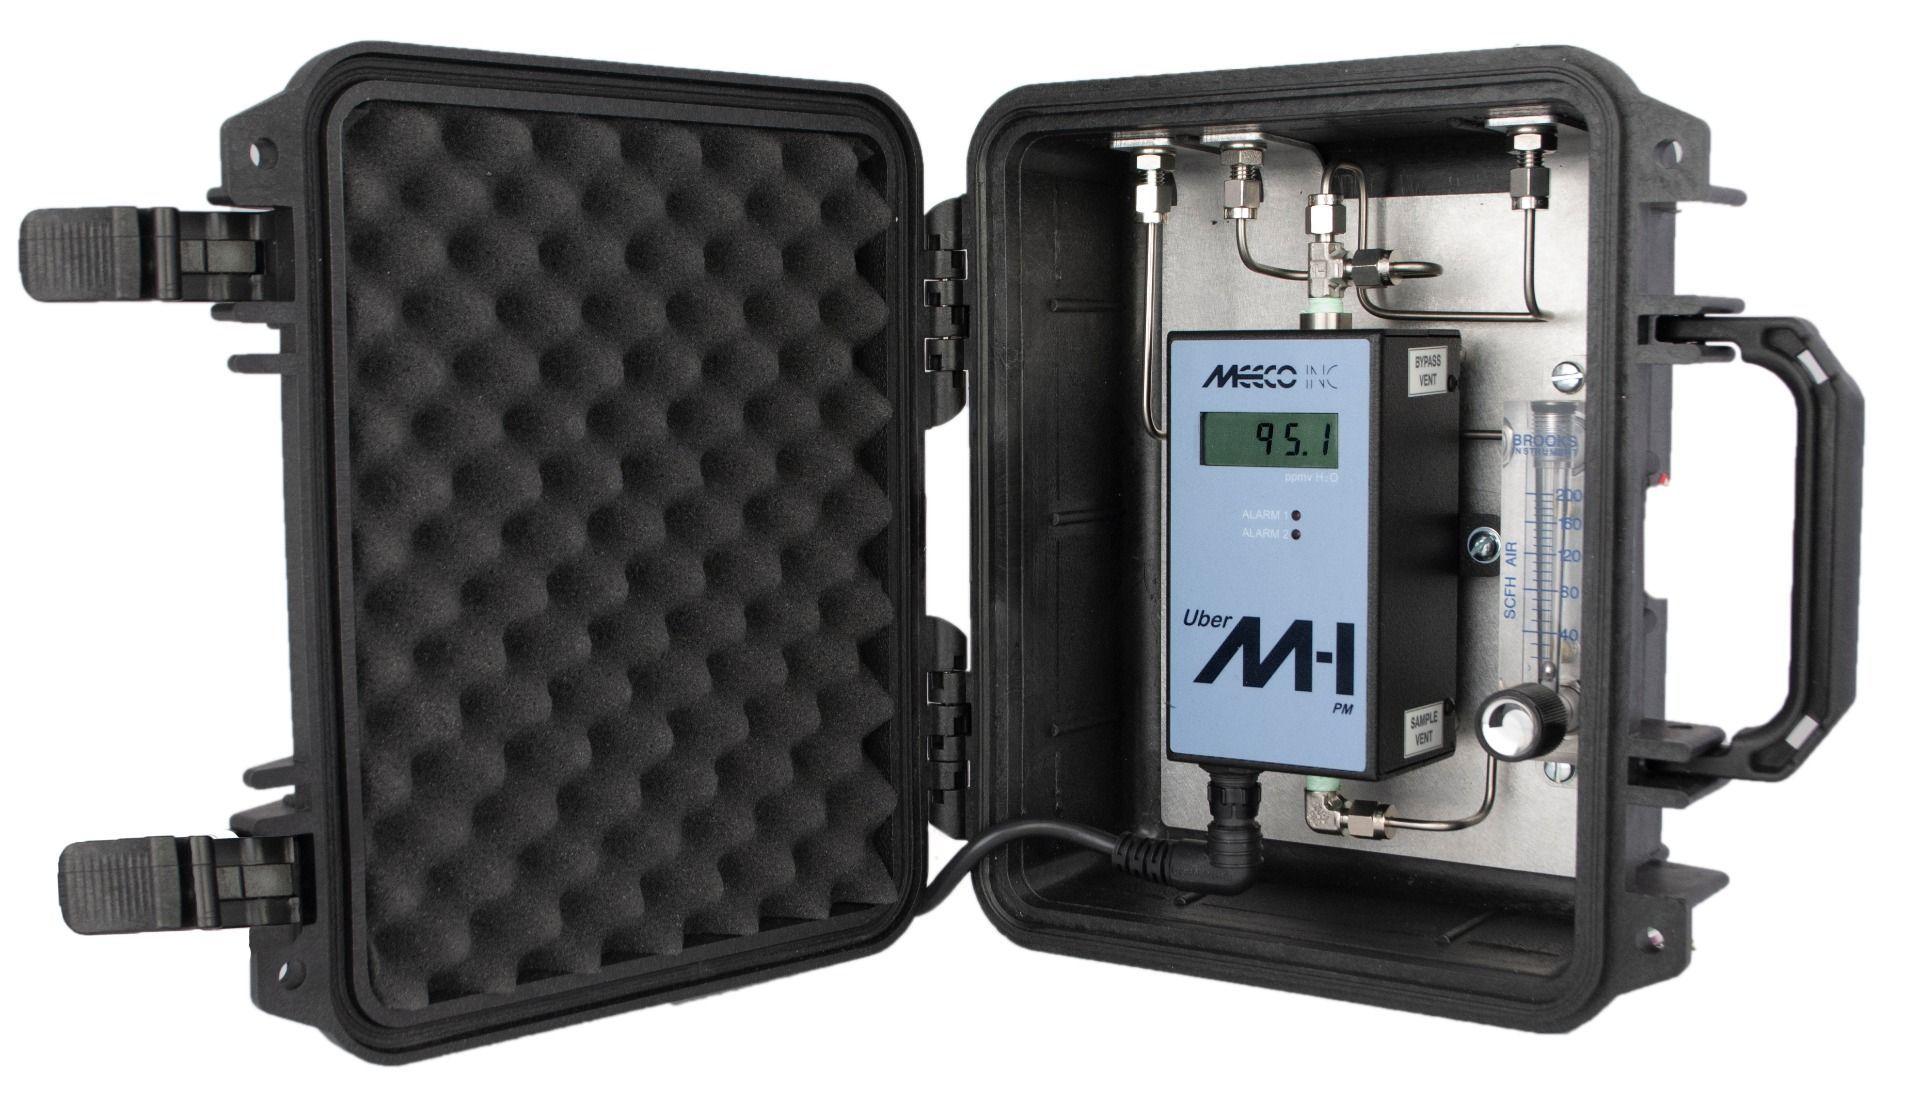 MEECO, Inc Uber M-I™ Moisture Gas Analyzer